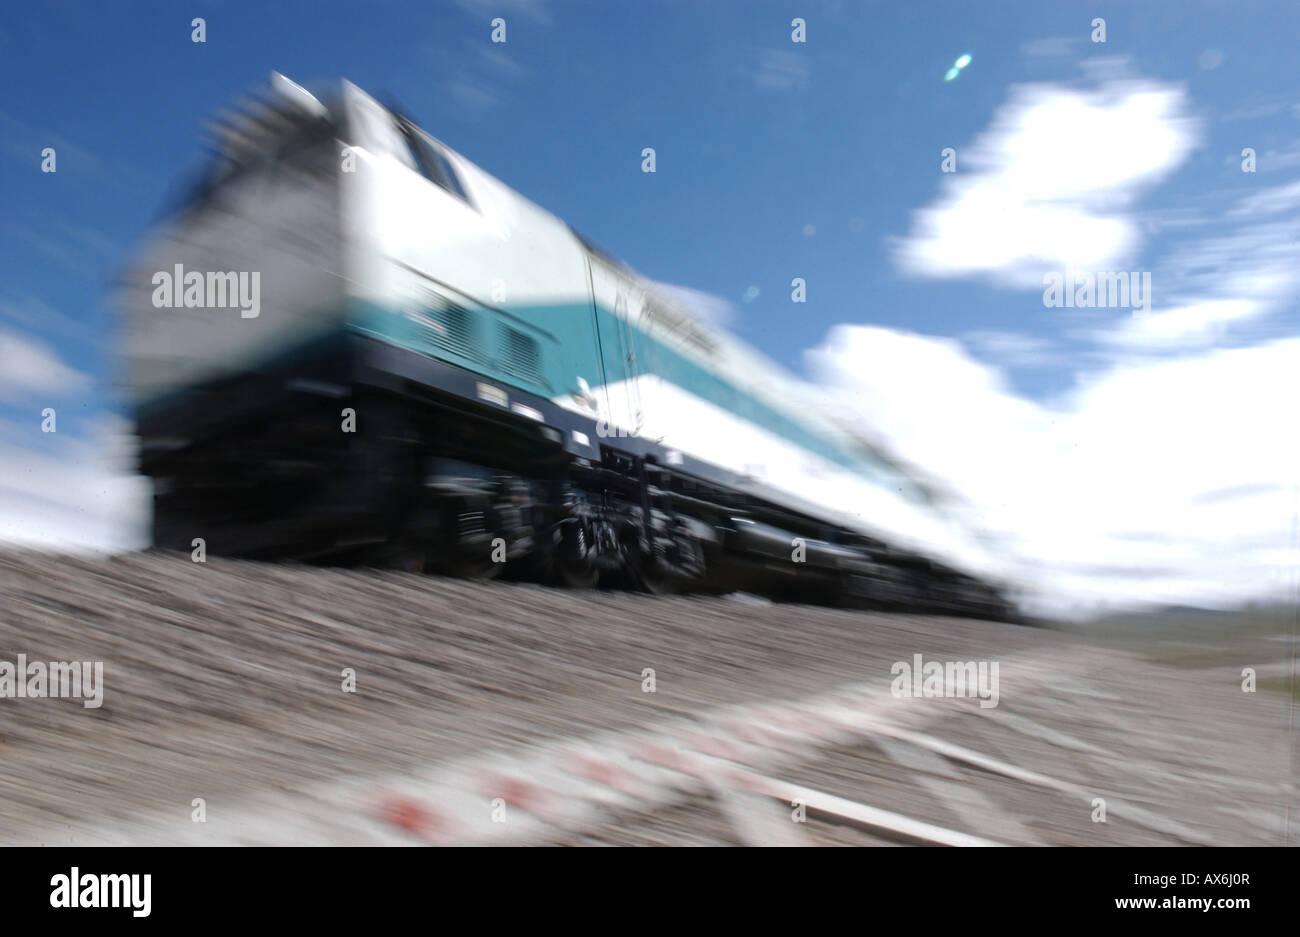 A train on the Tibet railway (Tibet train) crosses the 5072m Tangula pass, the railway's highest point. - Stock Image